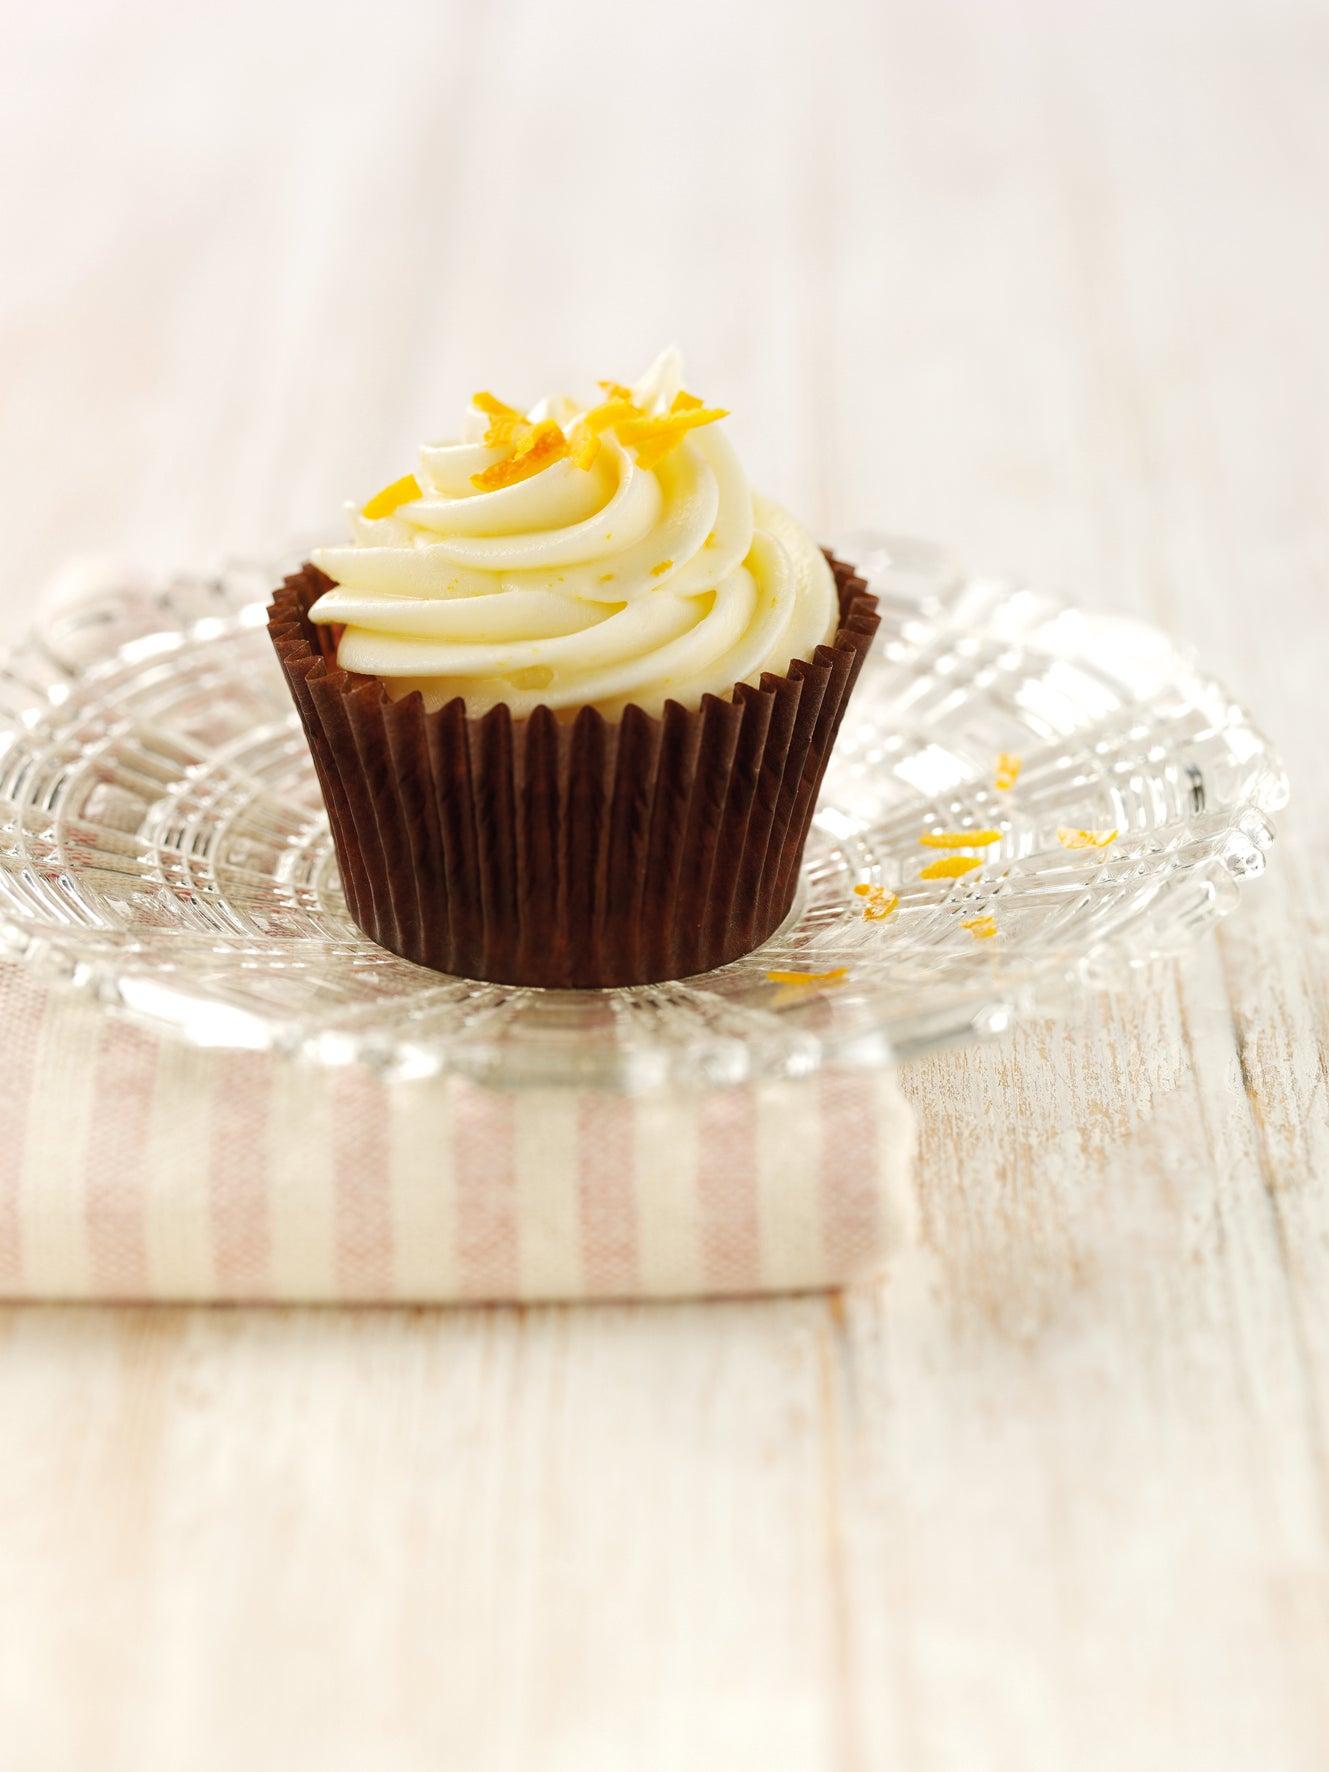 Nielsen-Massey-Orange-Extract-Cupcake.jpg